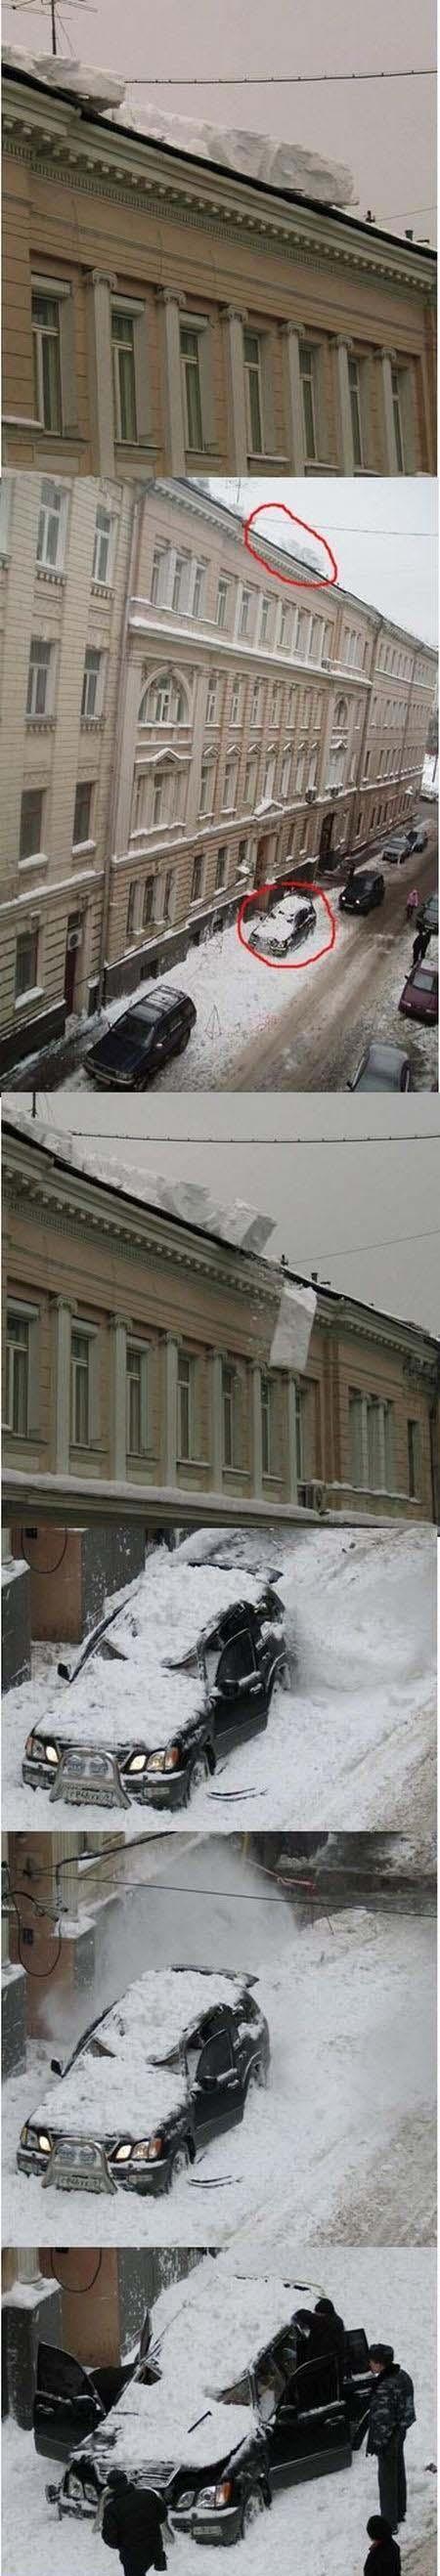 snow smash